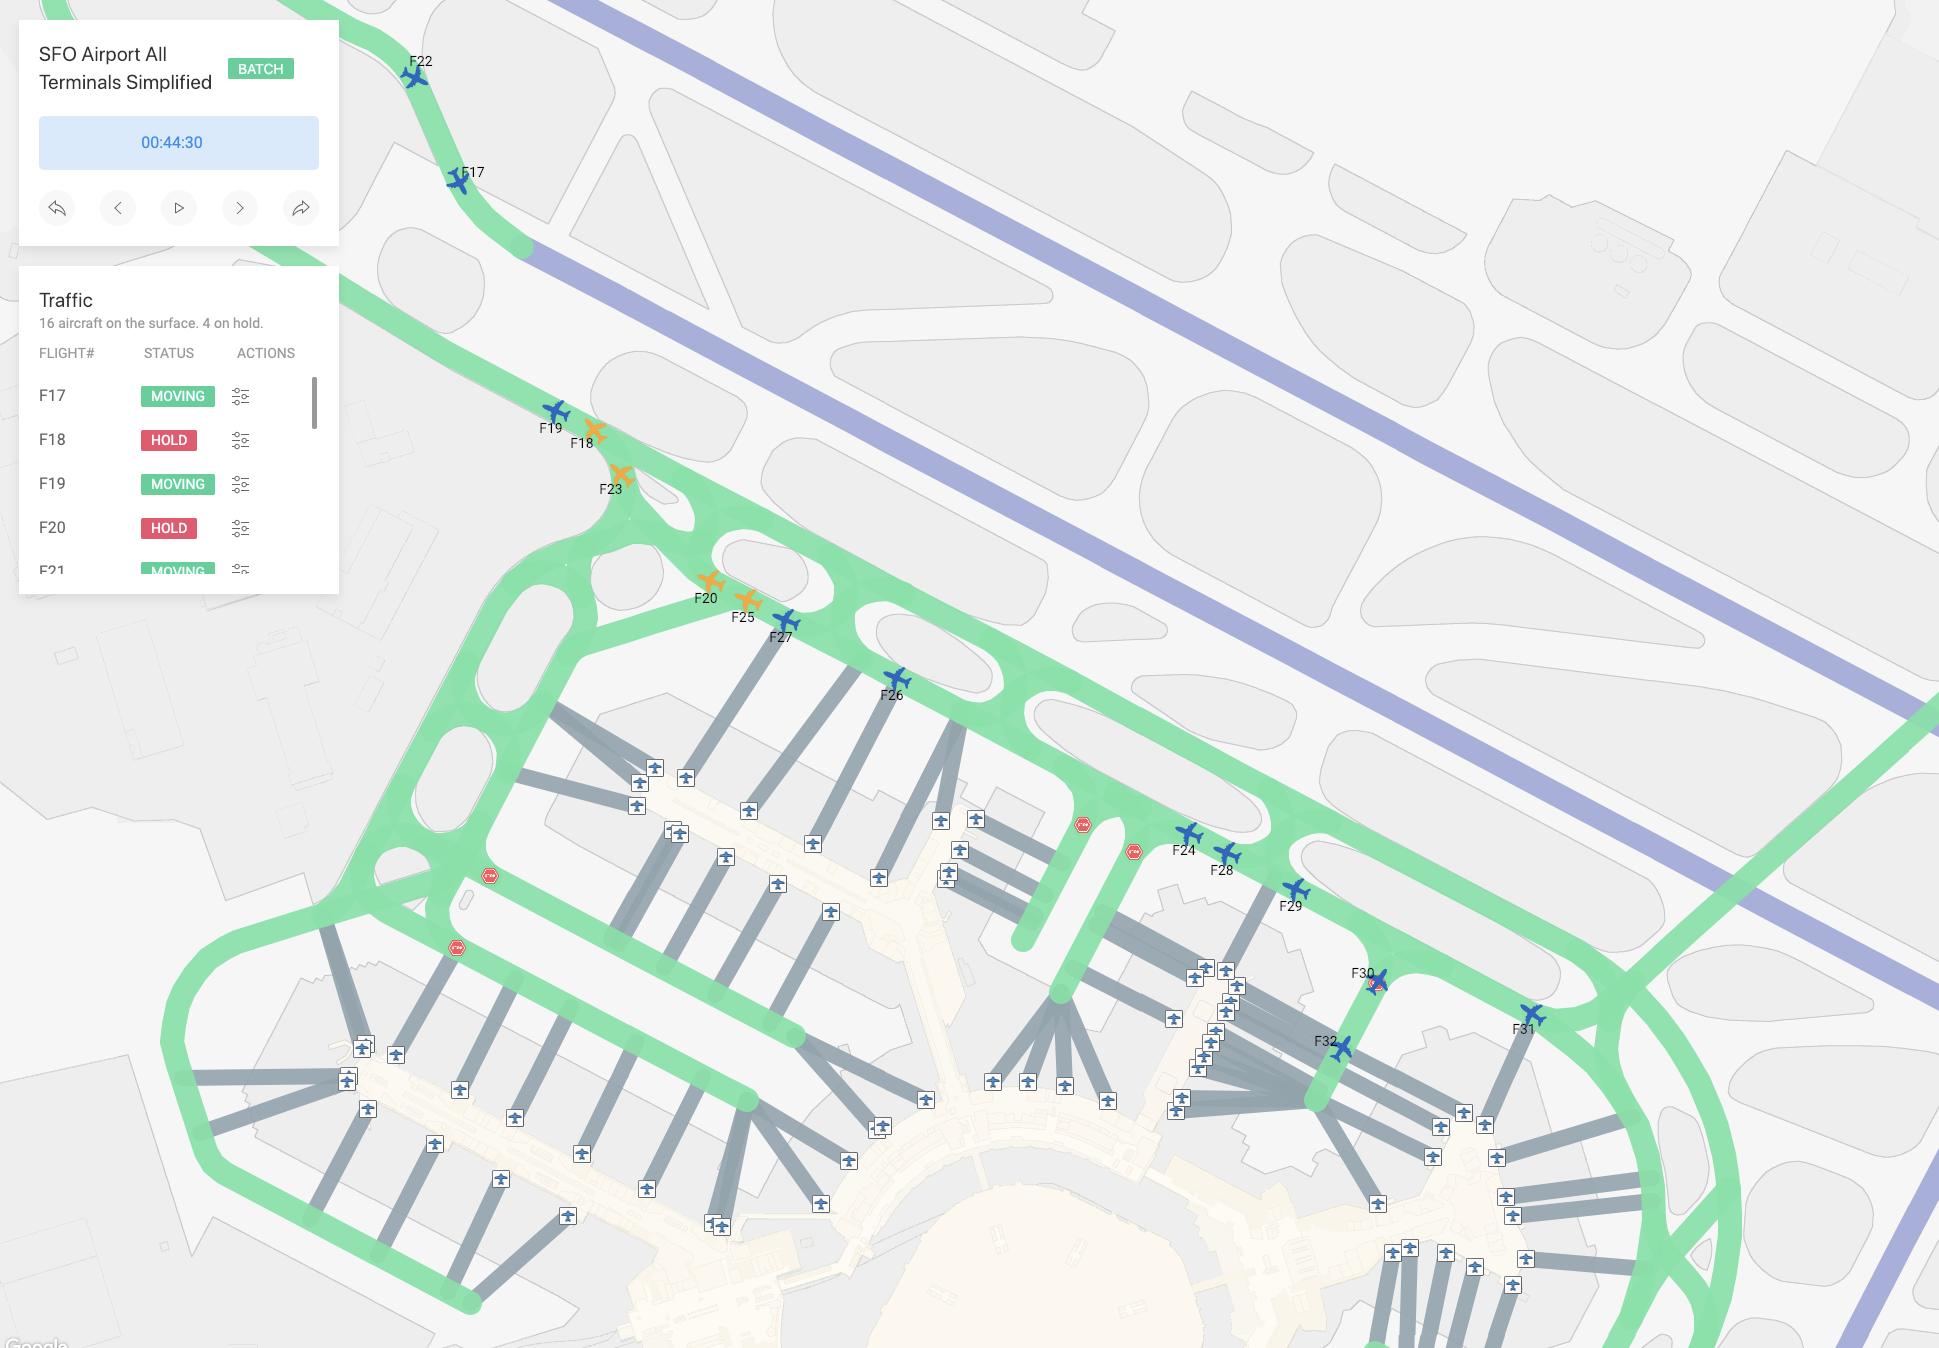 GitHub - heronyang/airport-simulation: Airport Surface